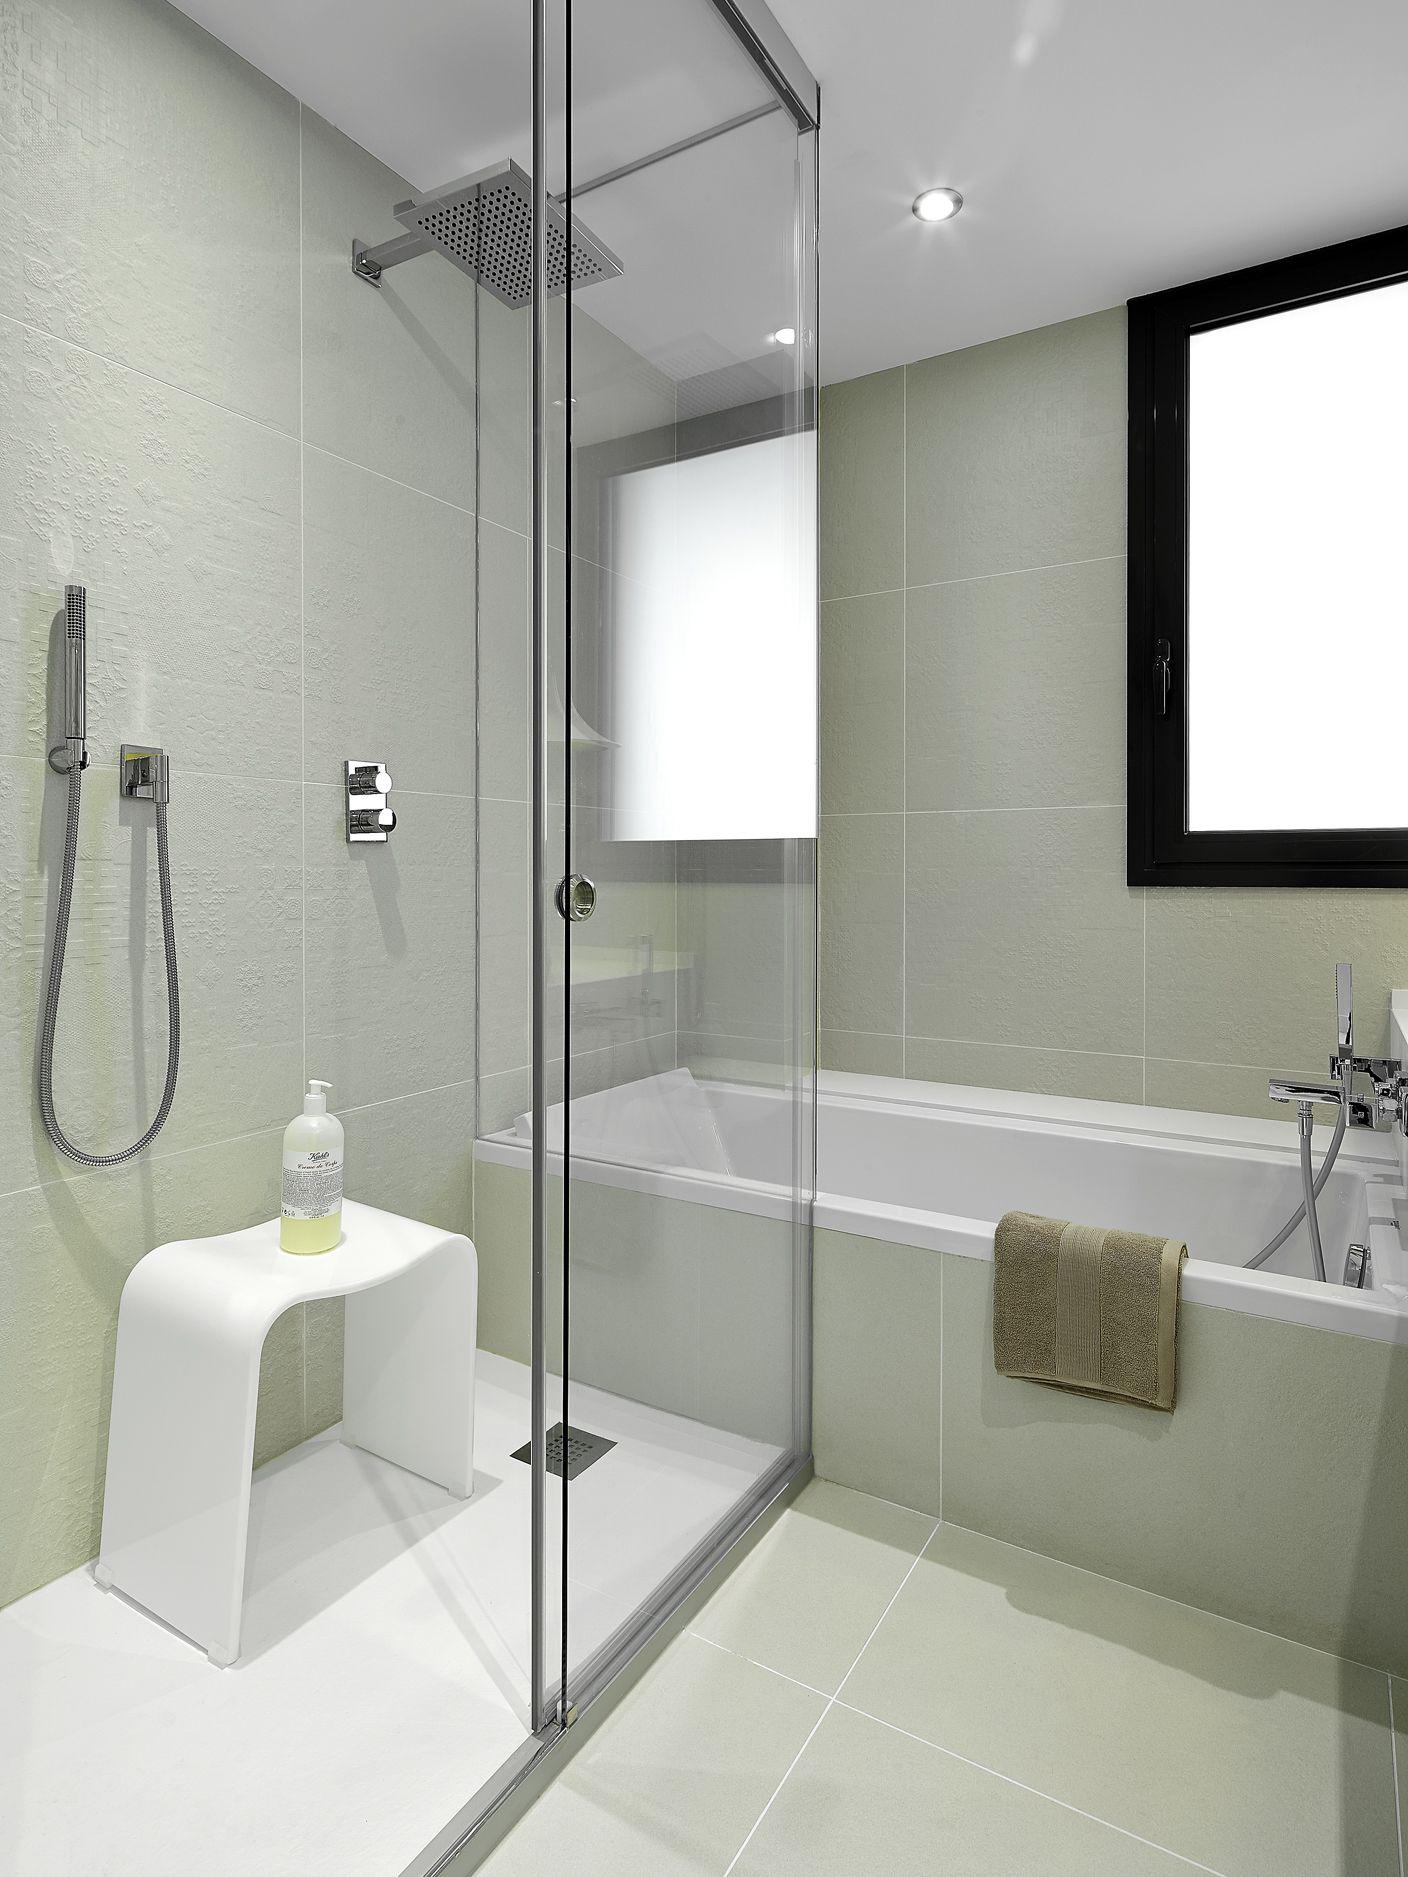 Molins interiors arquitectura interior interiorismo - Cuartos de bano elegantes ...